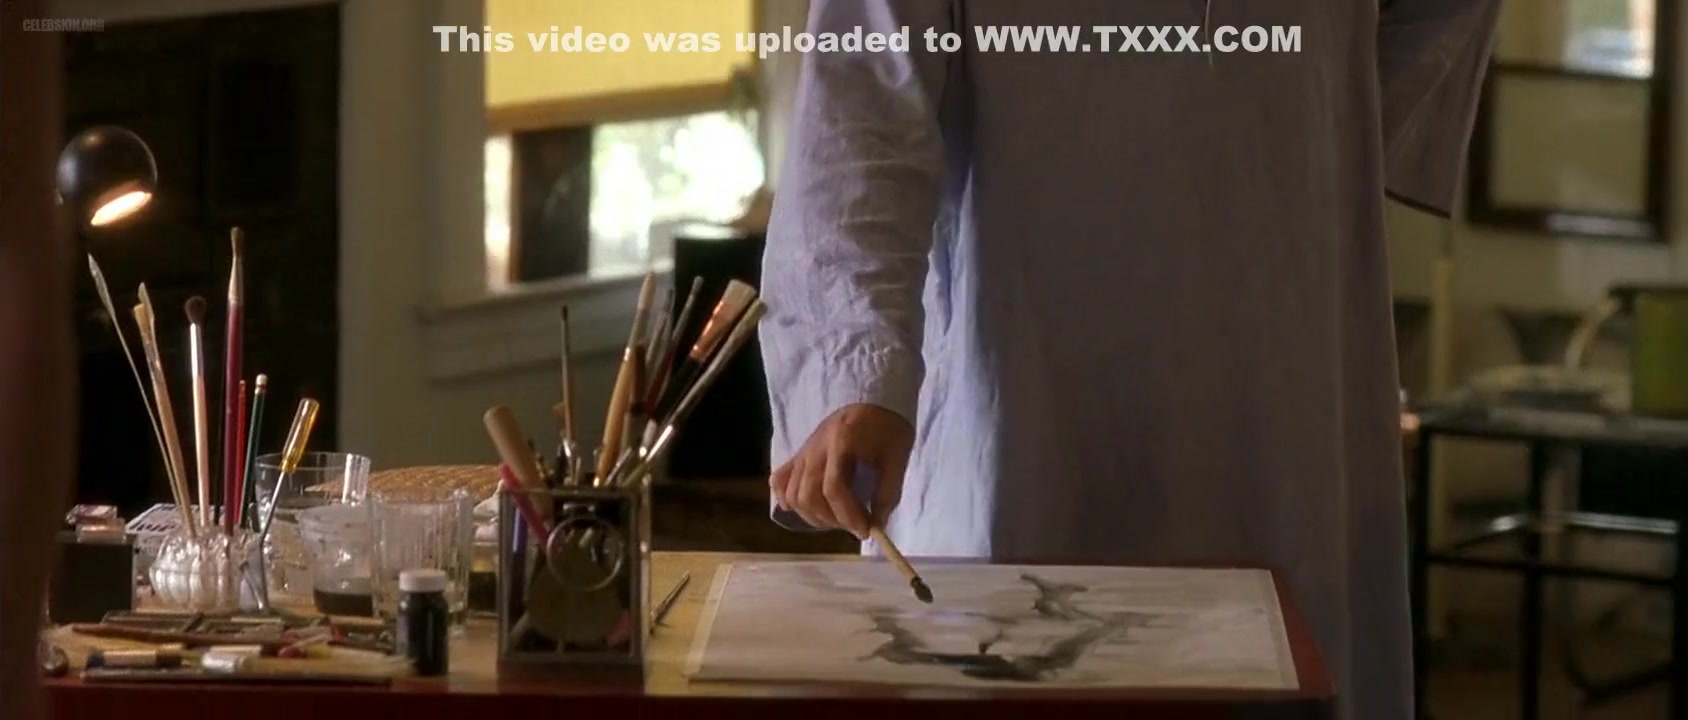 xXx Pics Reverse cowgirl handjob freeones board